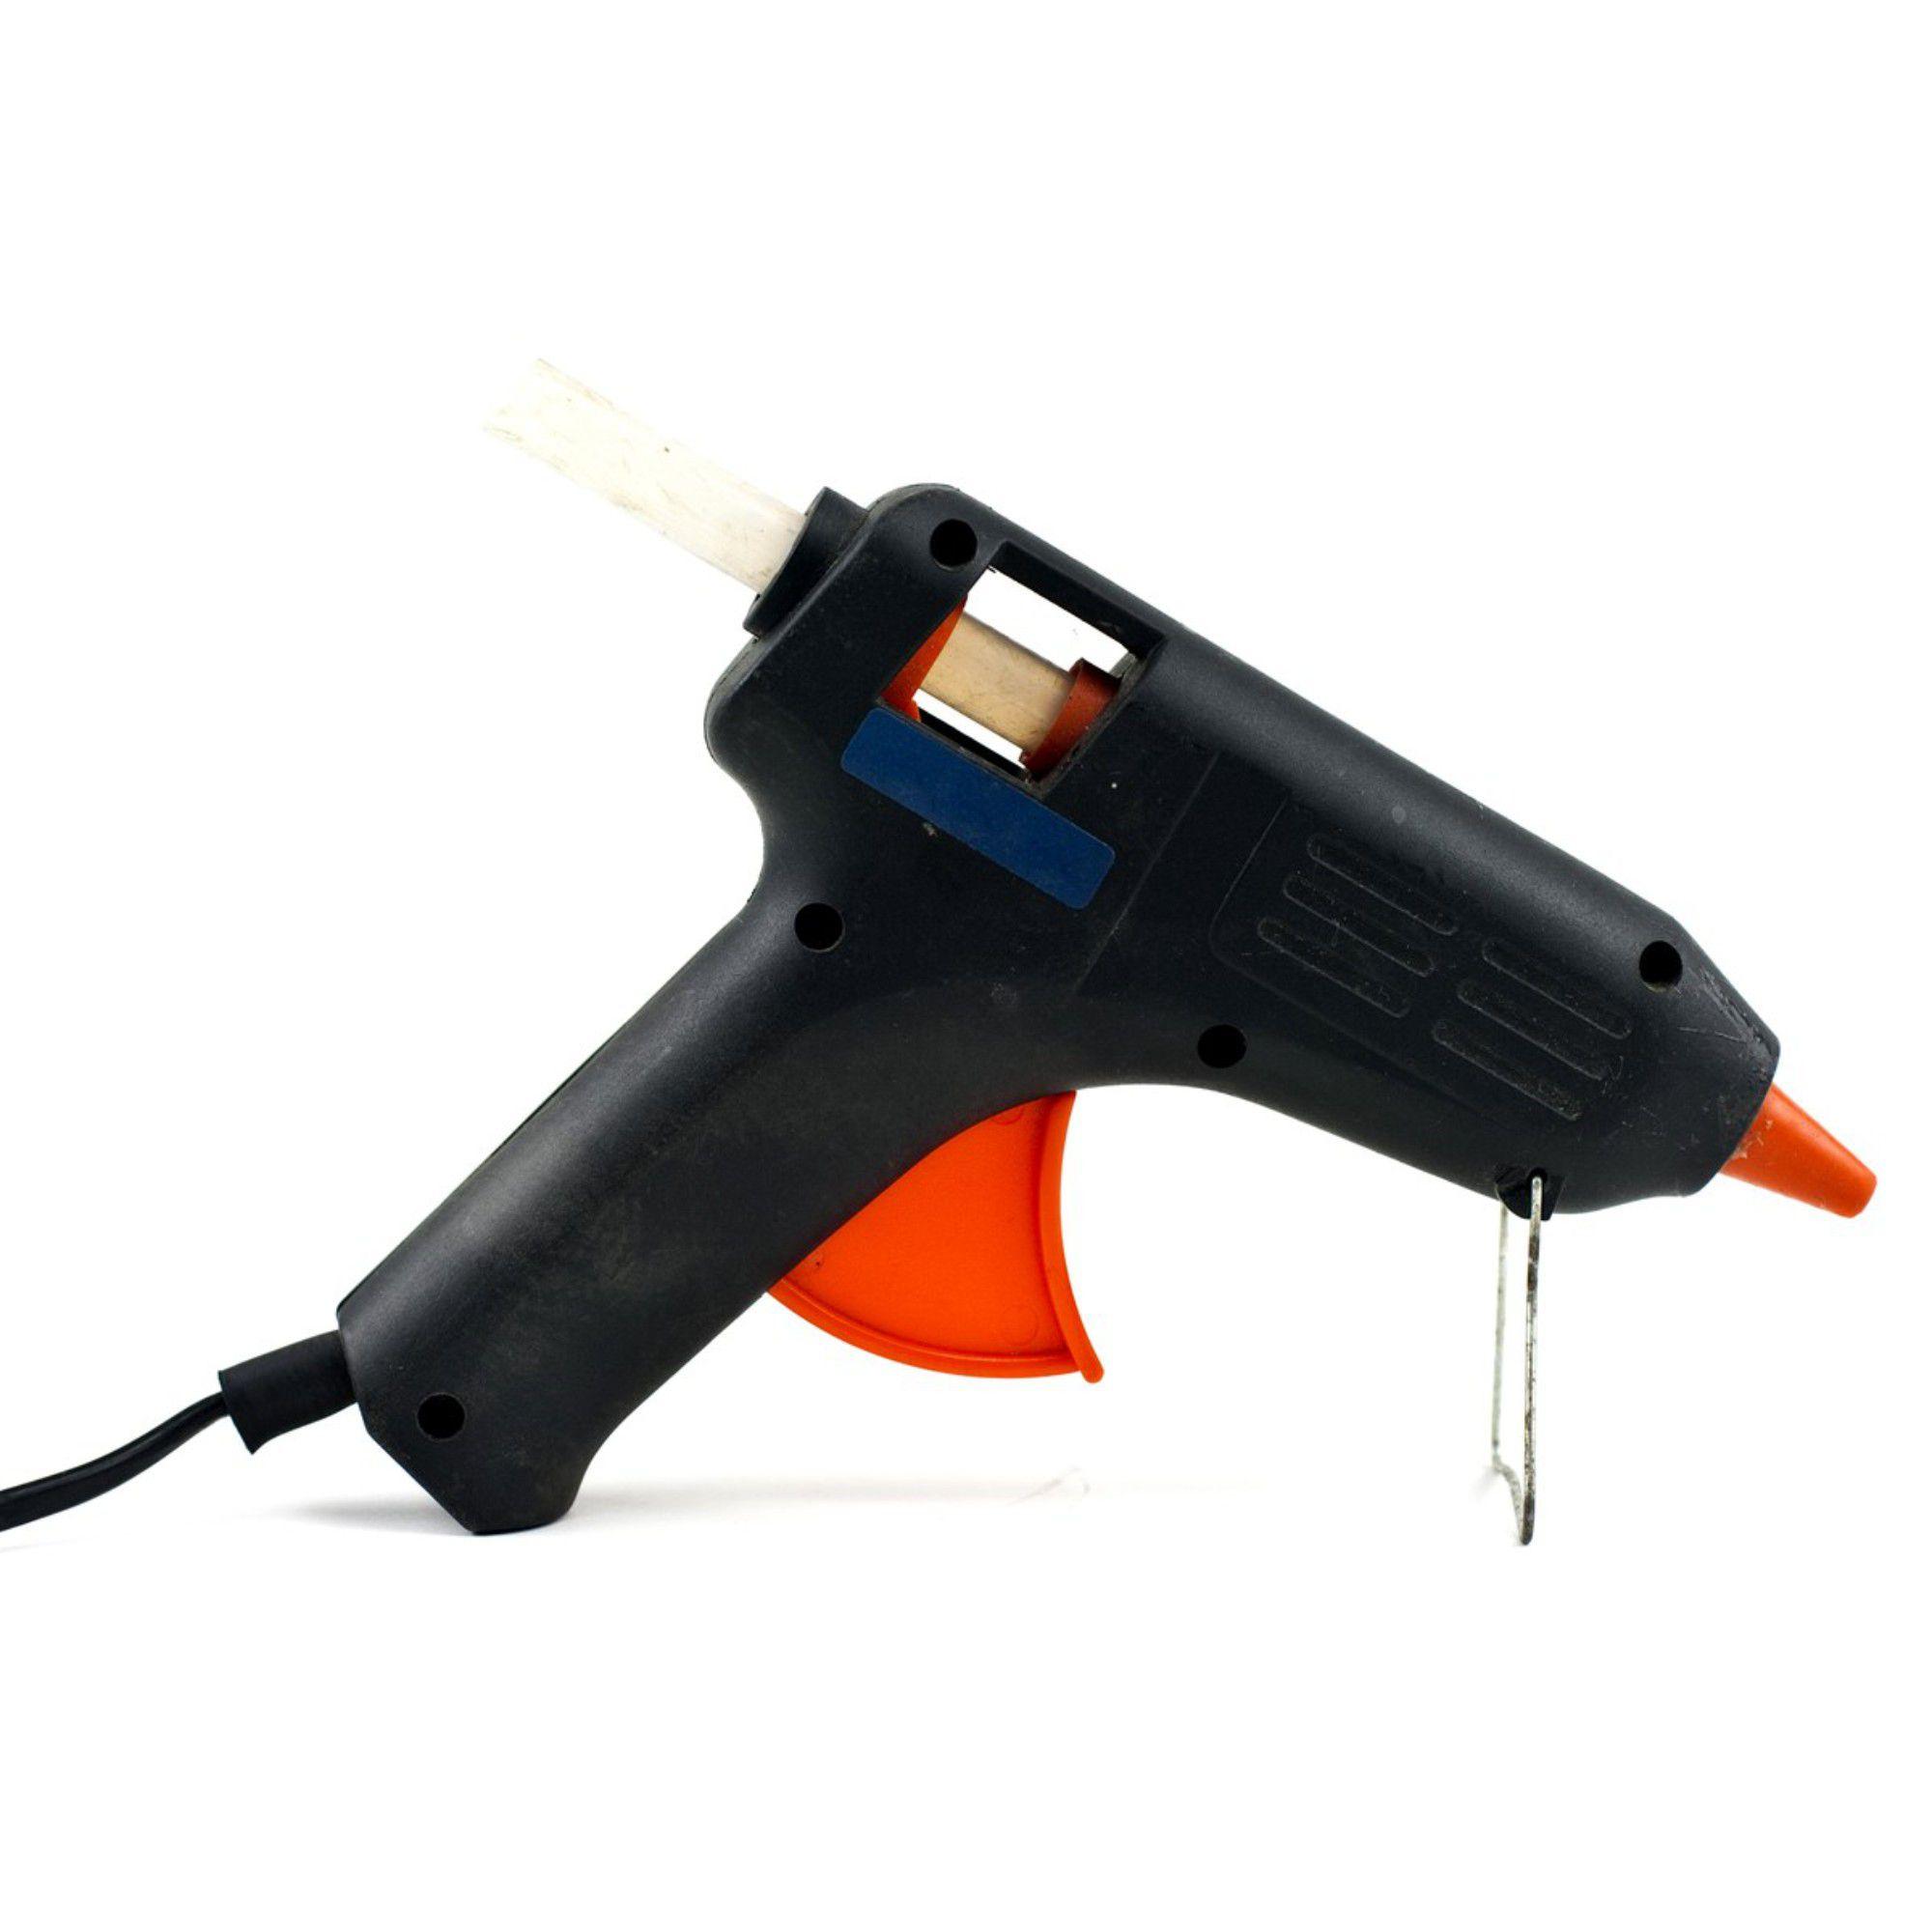 Pistola Aplicador De Cola Quente Profissional Bivolt 10w